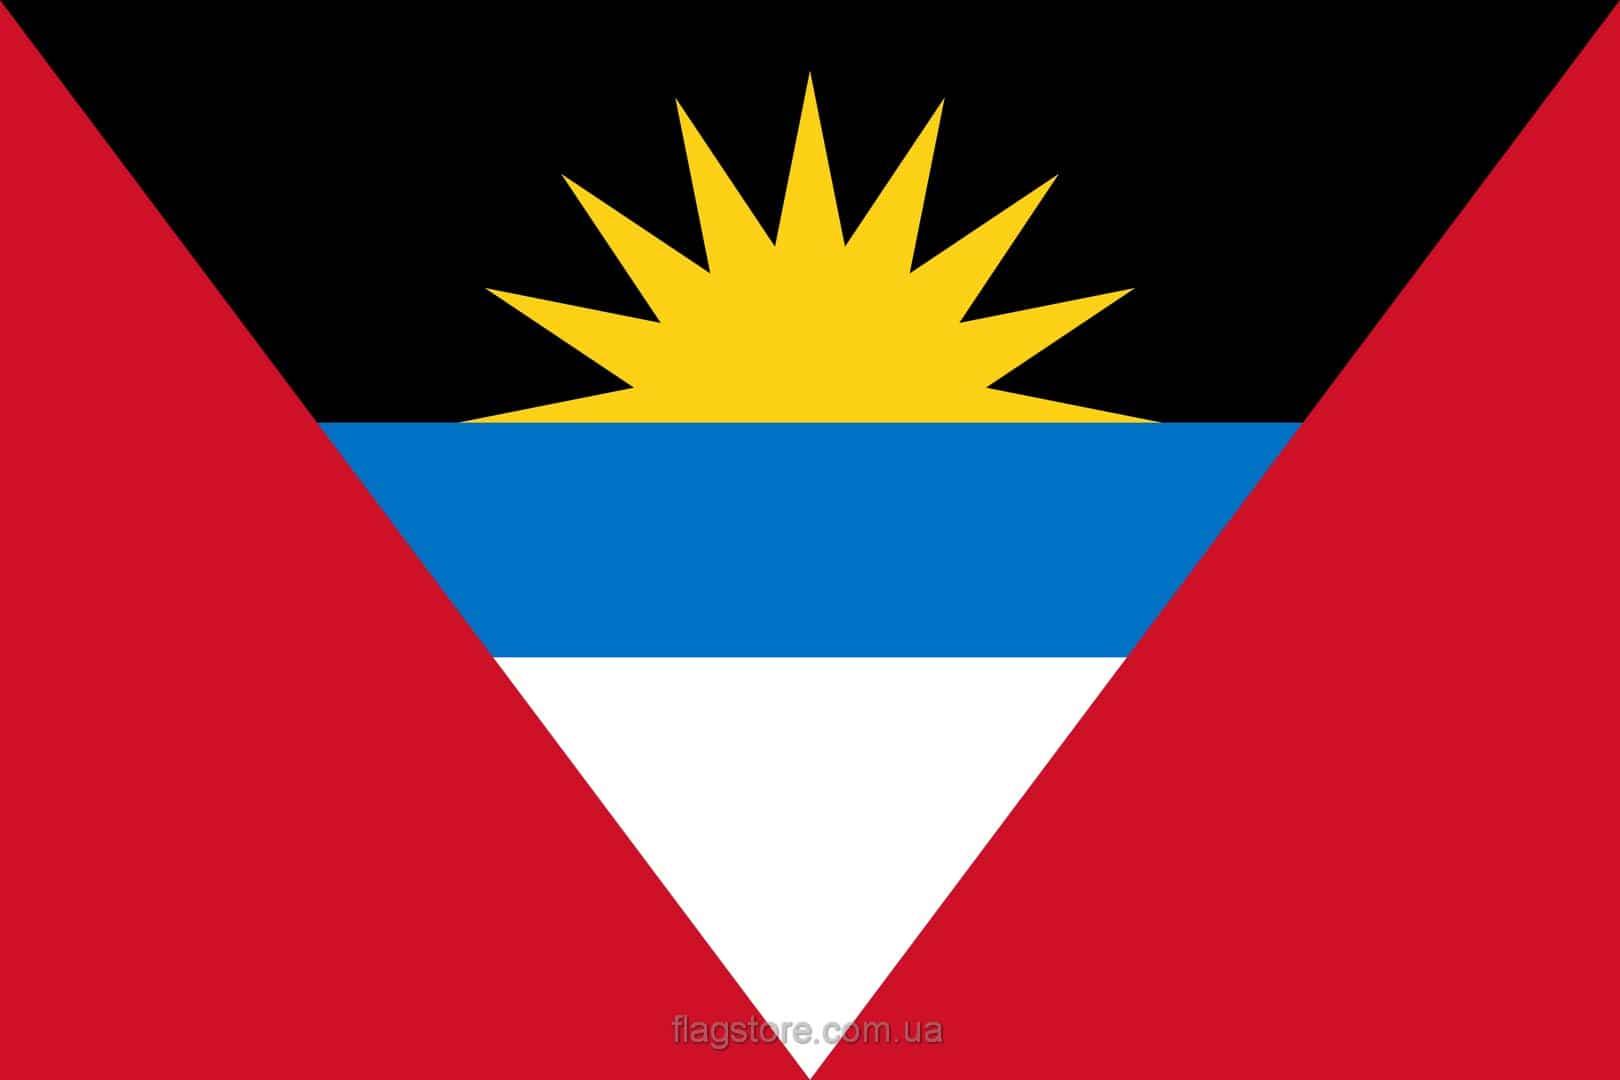 Купить флаг Антигуа и Барбуды (страны Антигуа и Барбуда)